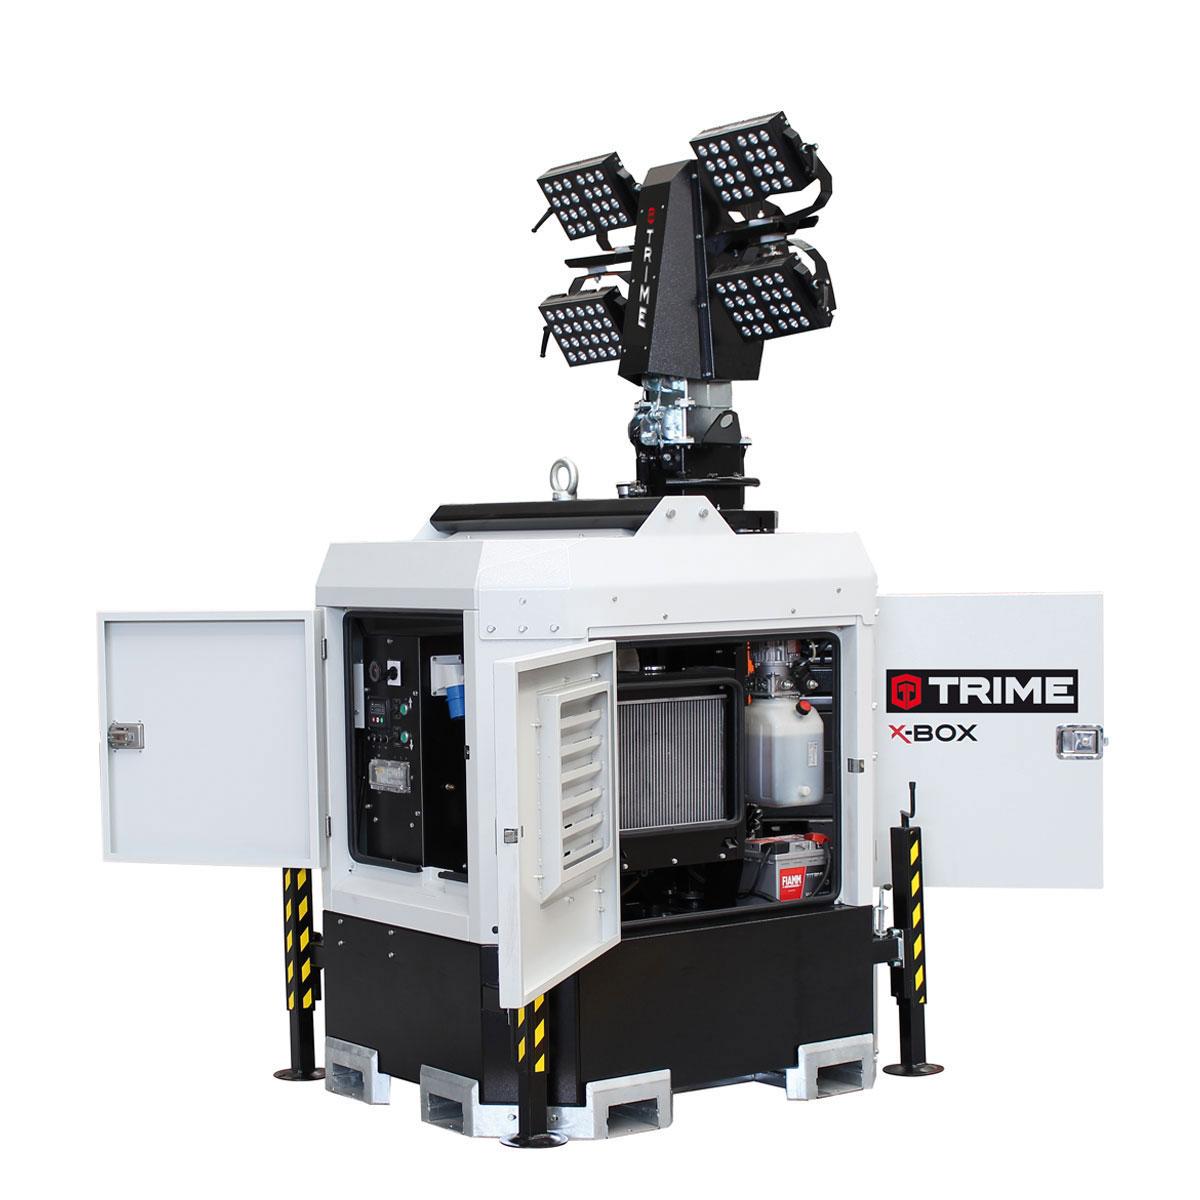 prozektoru-masts-led-x-box-4x300W-48V-durvis-atvertas